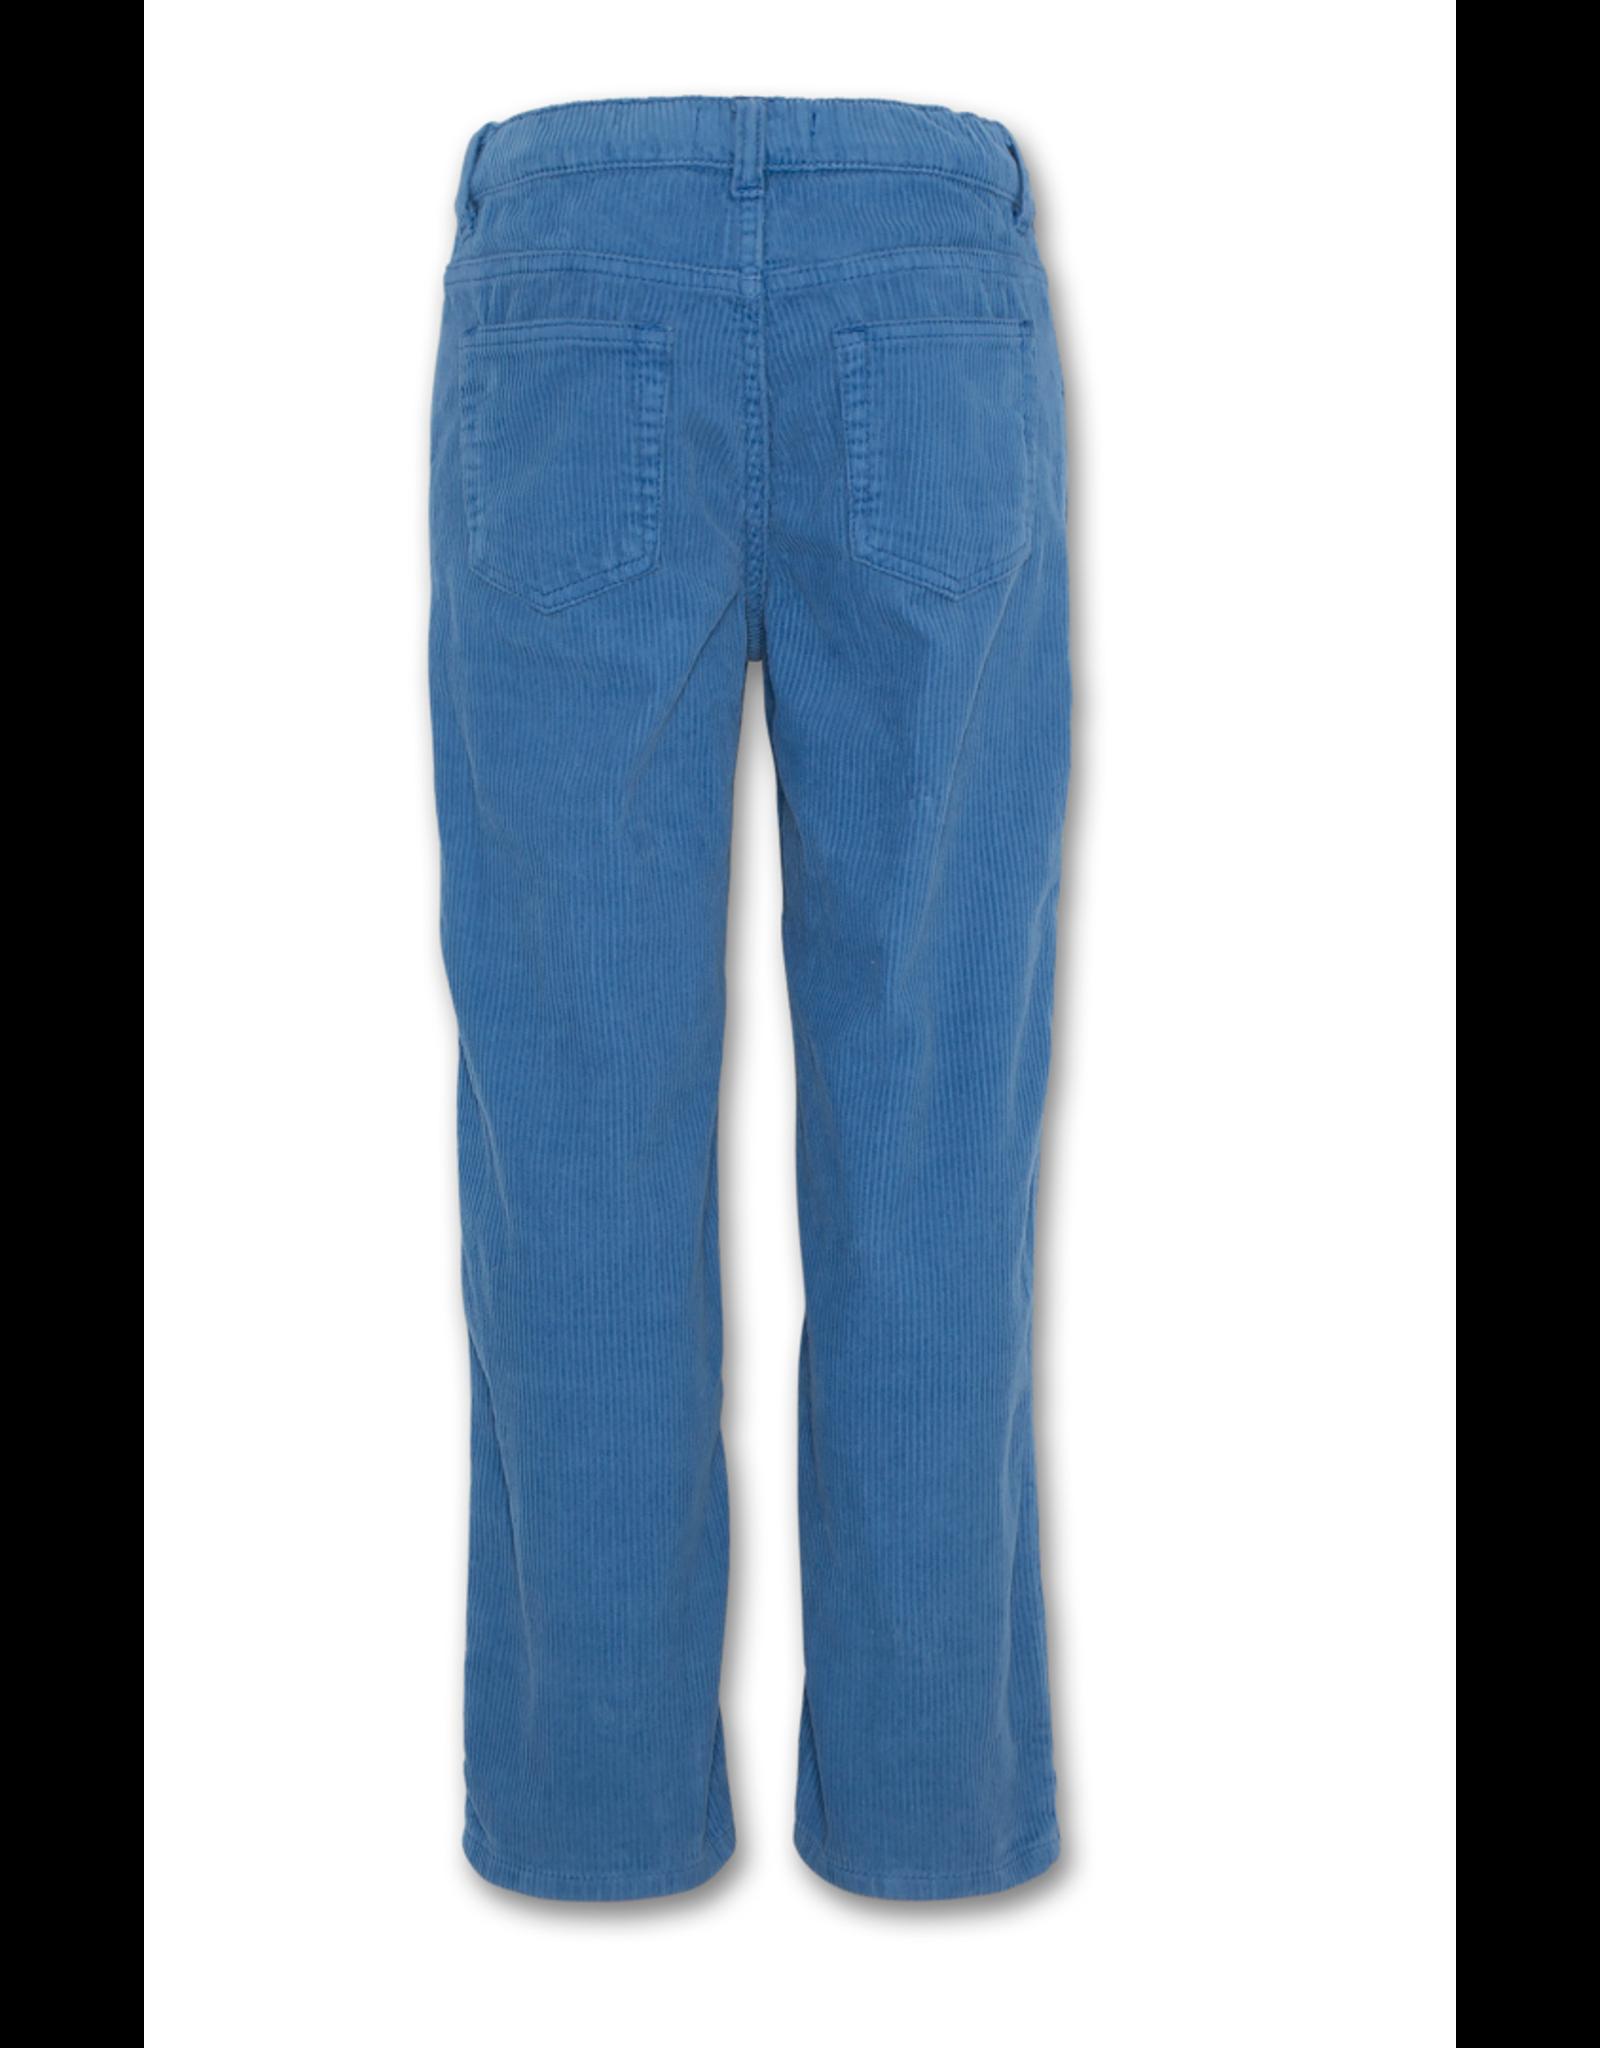 A076 AO76 broek corduroy lichtblauw